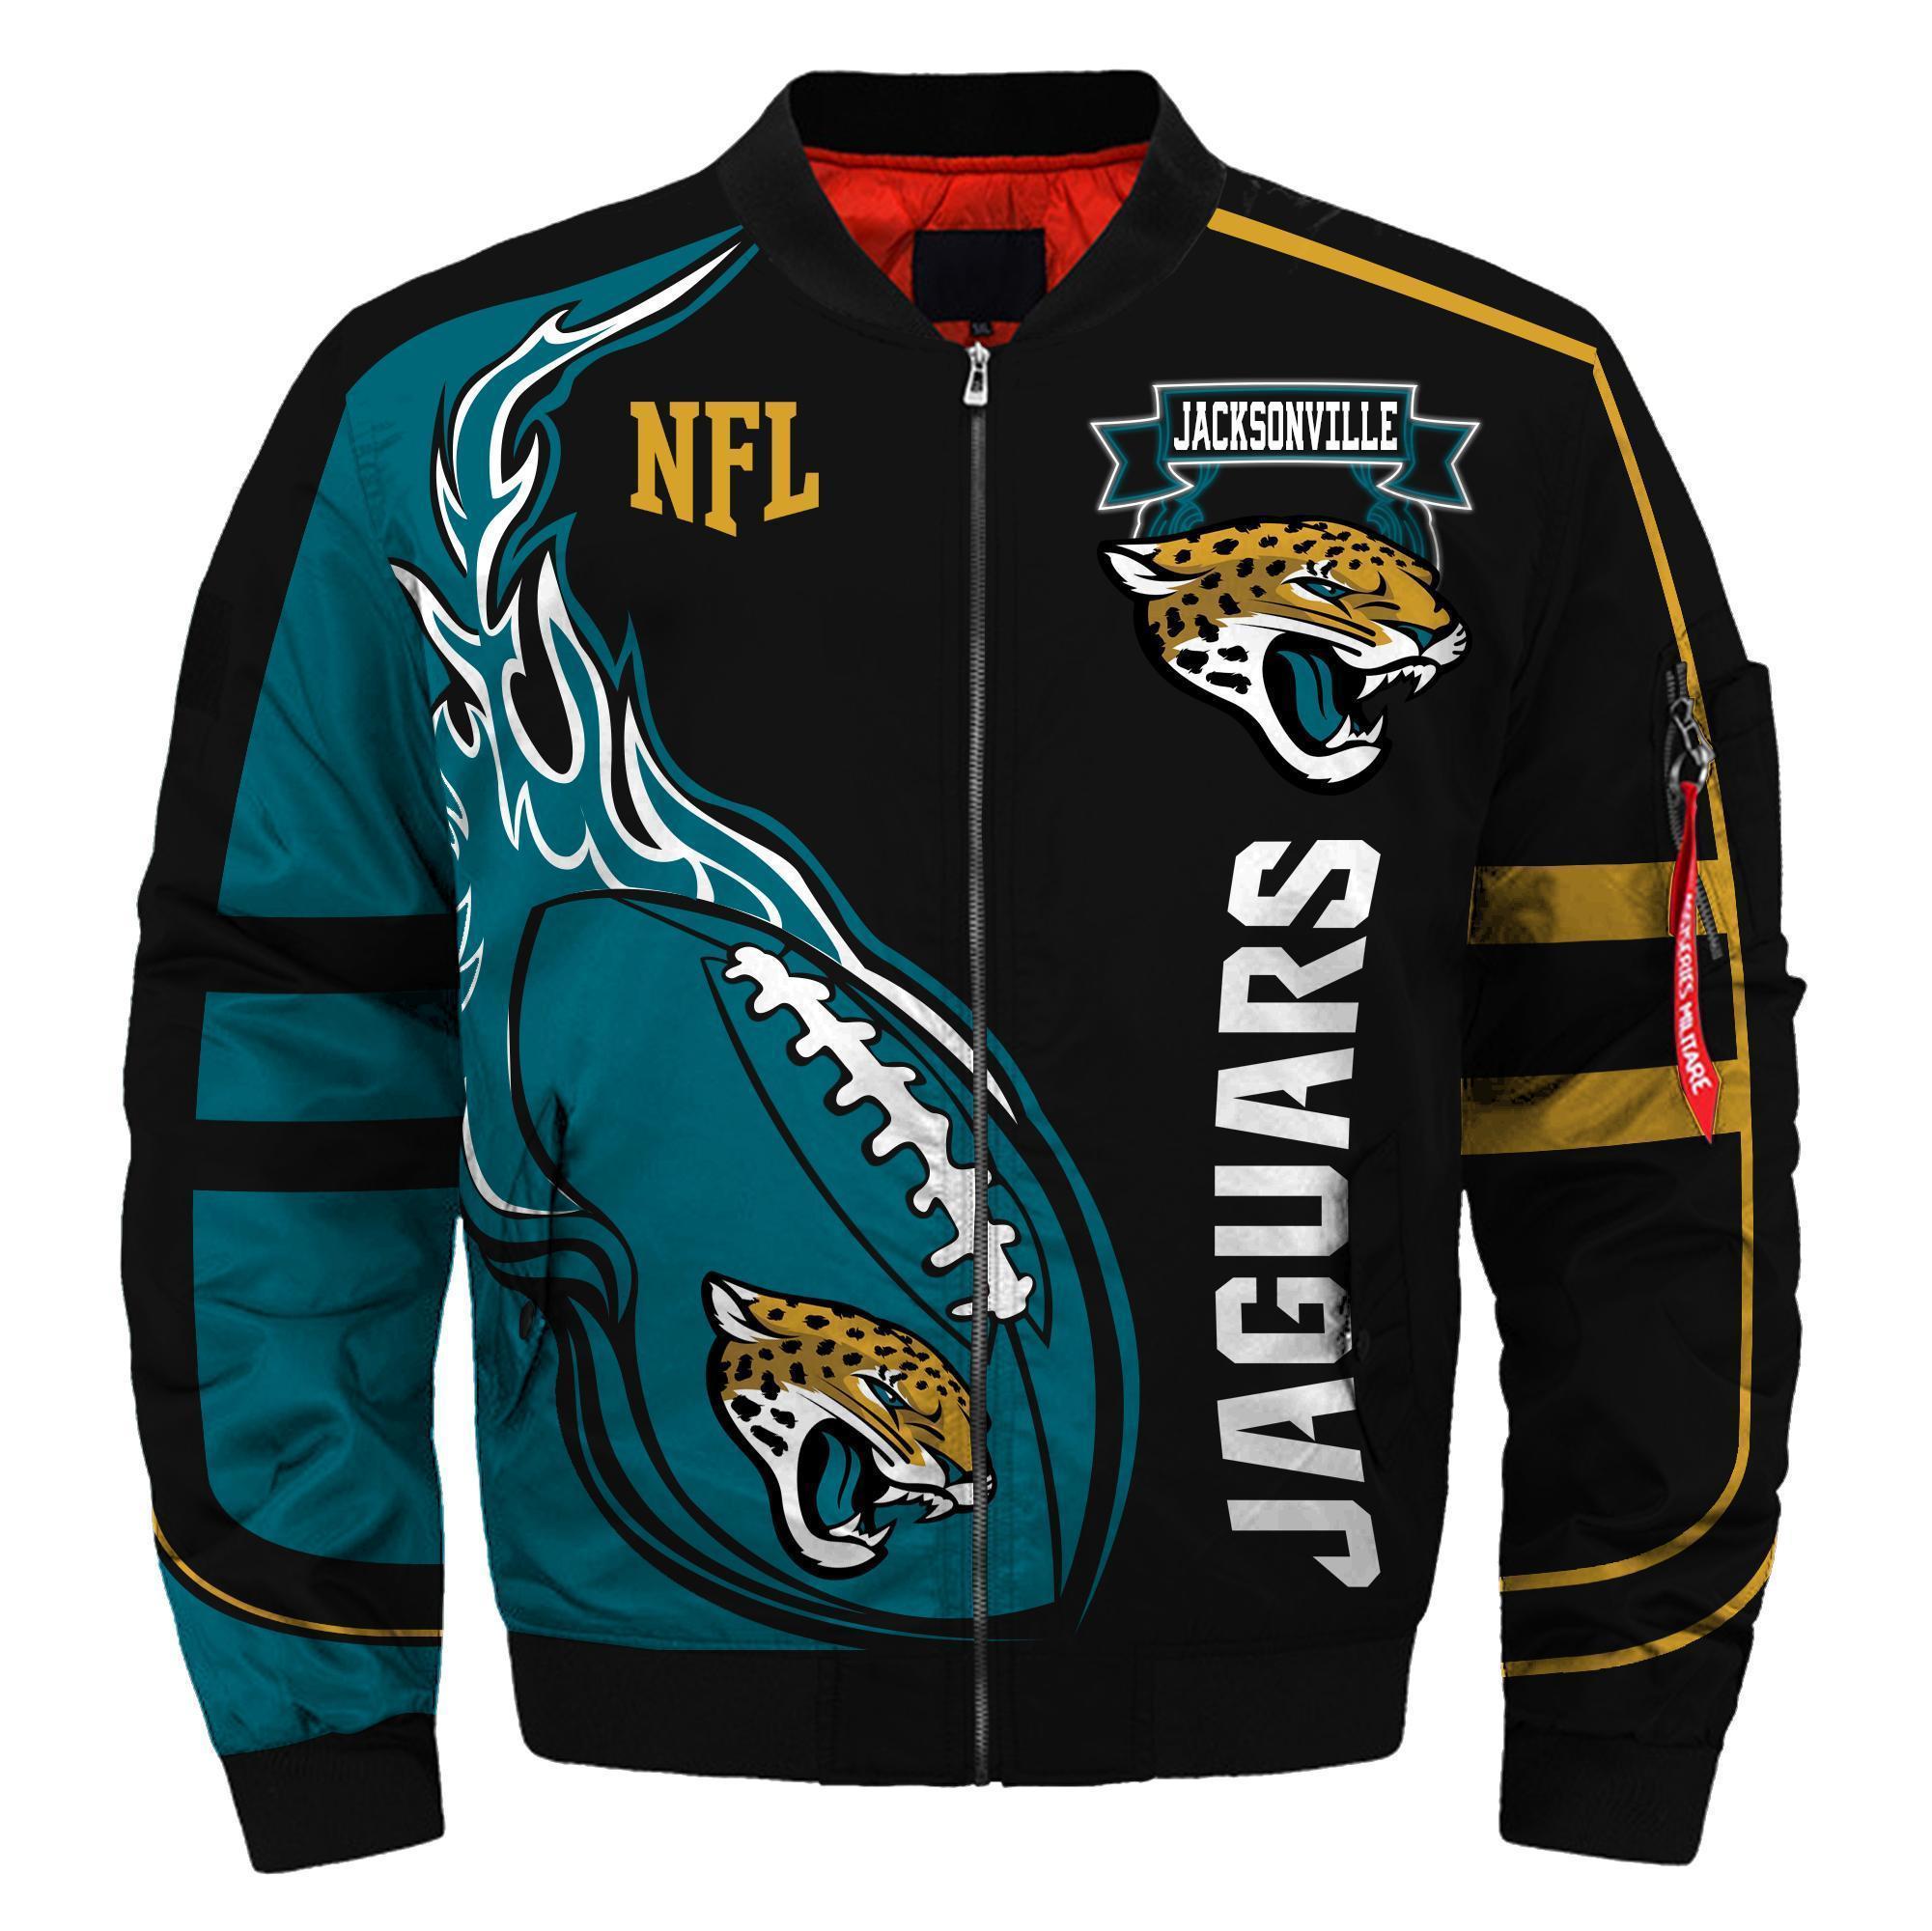 011 Nfl Jacksonville Jaguars Custom North Face Winter Jacket Bomer High Quality Plus Size Jacket